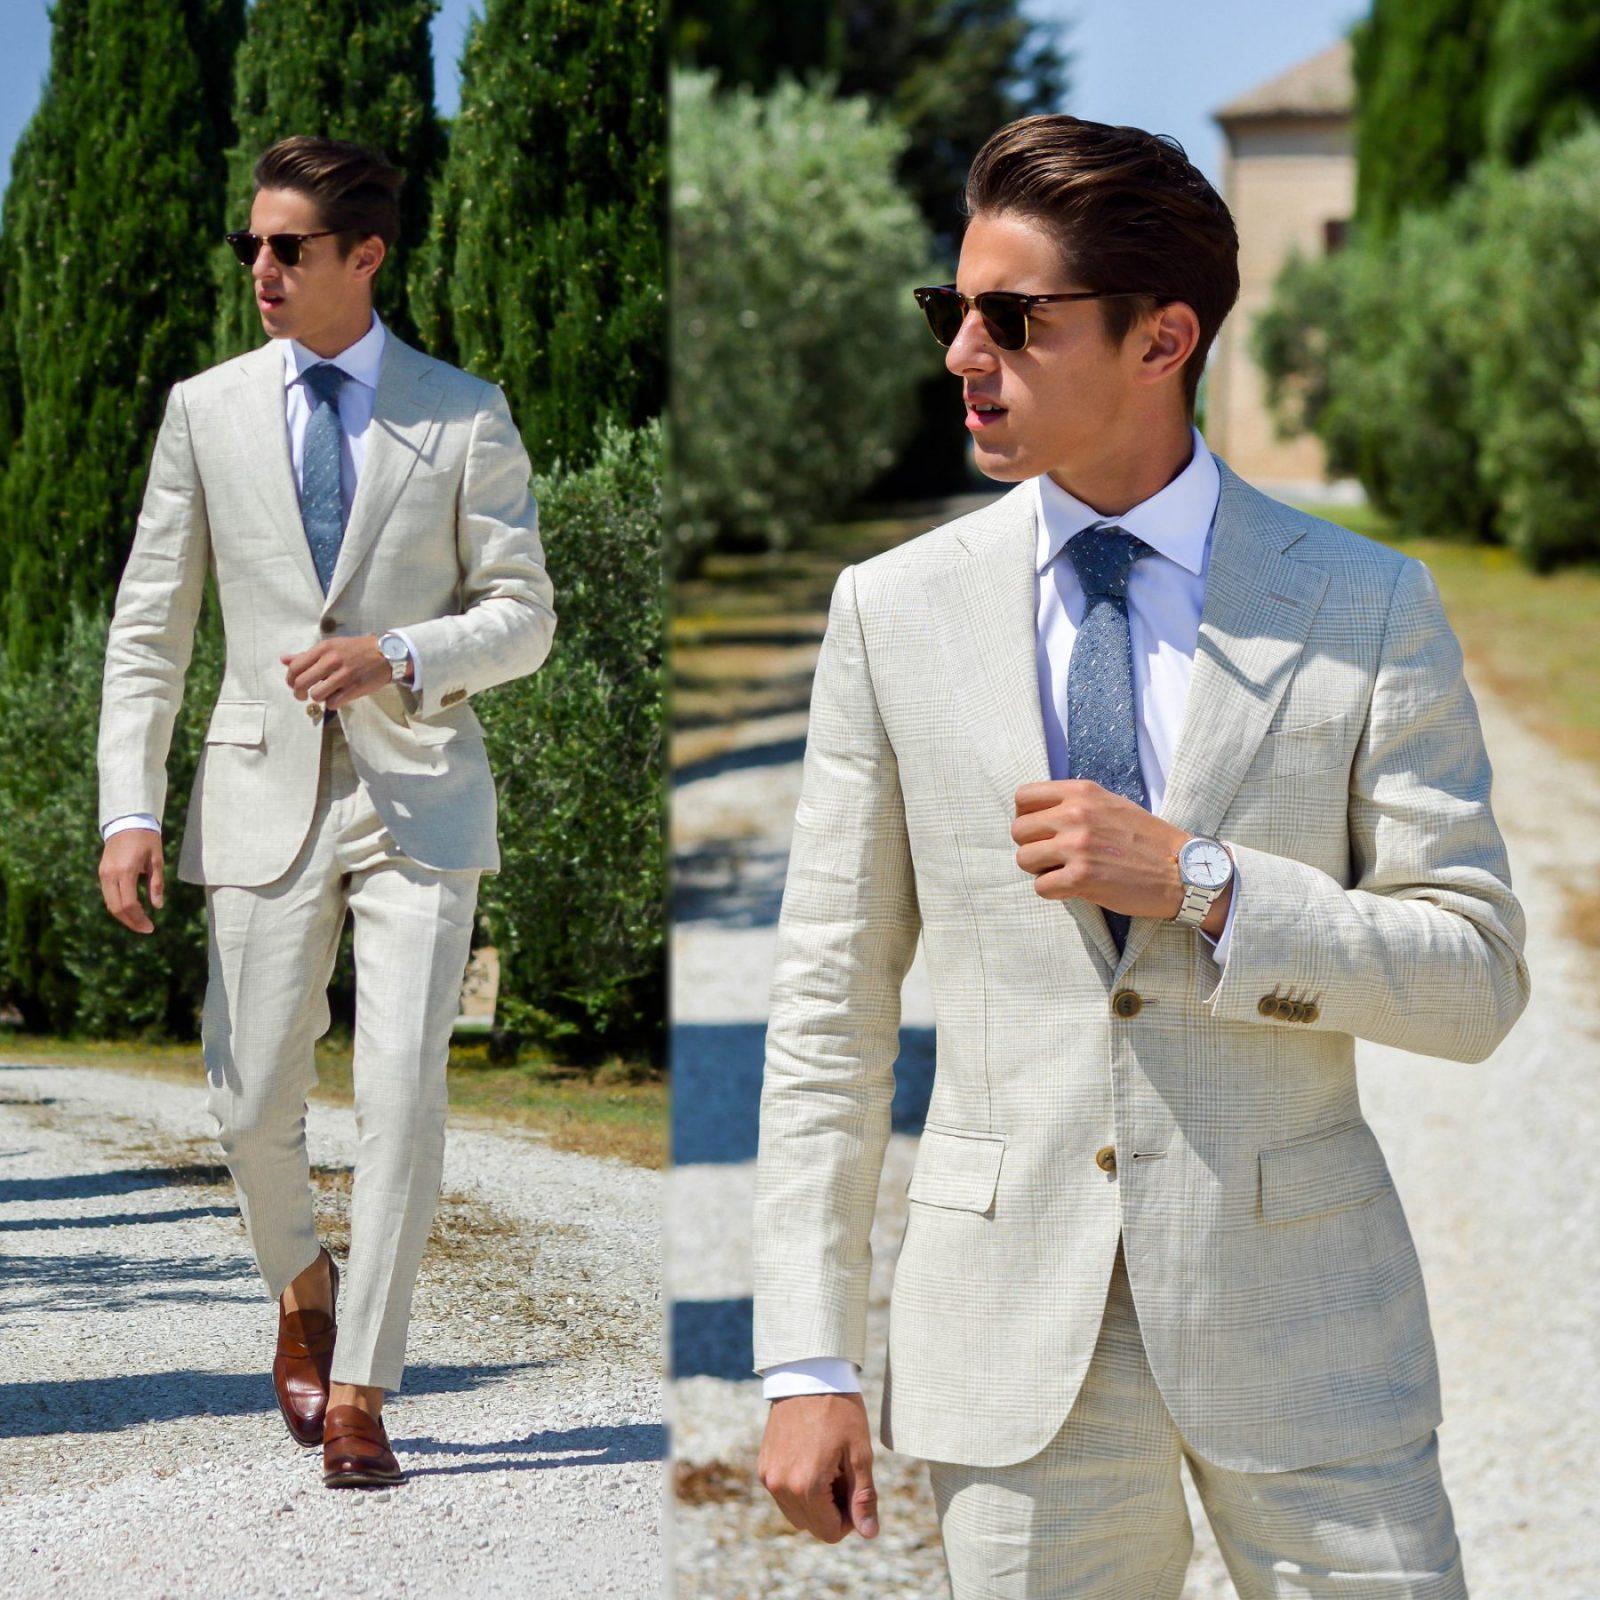 SuitWedding_Menstyle_MatthiasGeerts